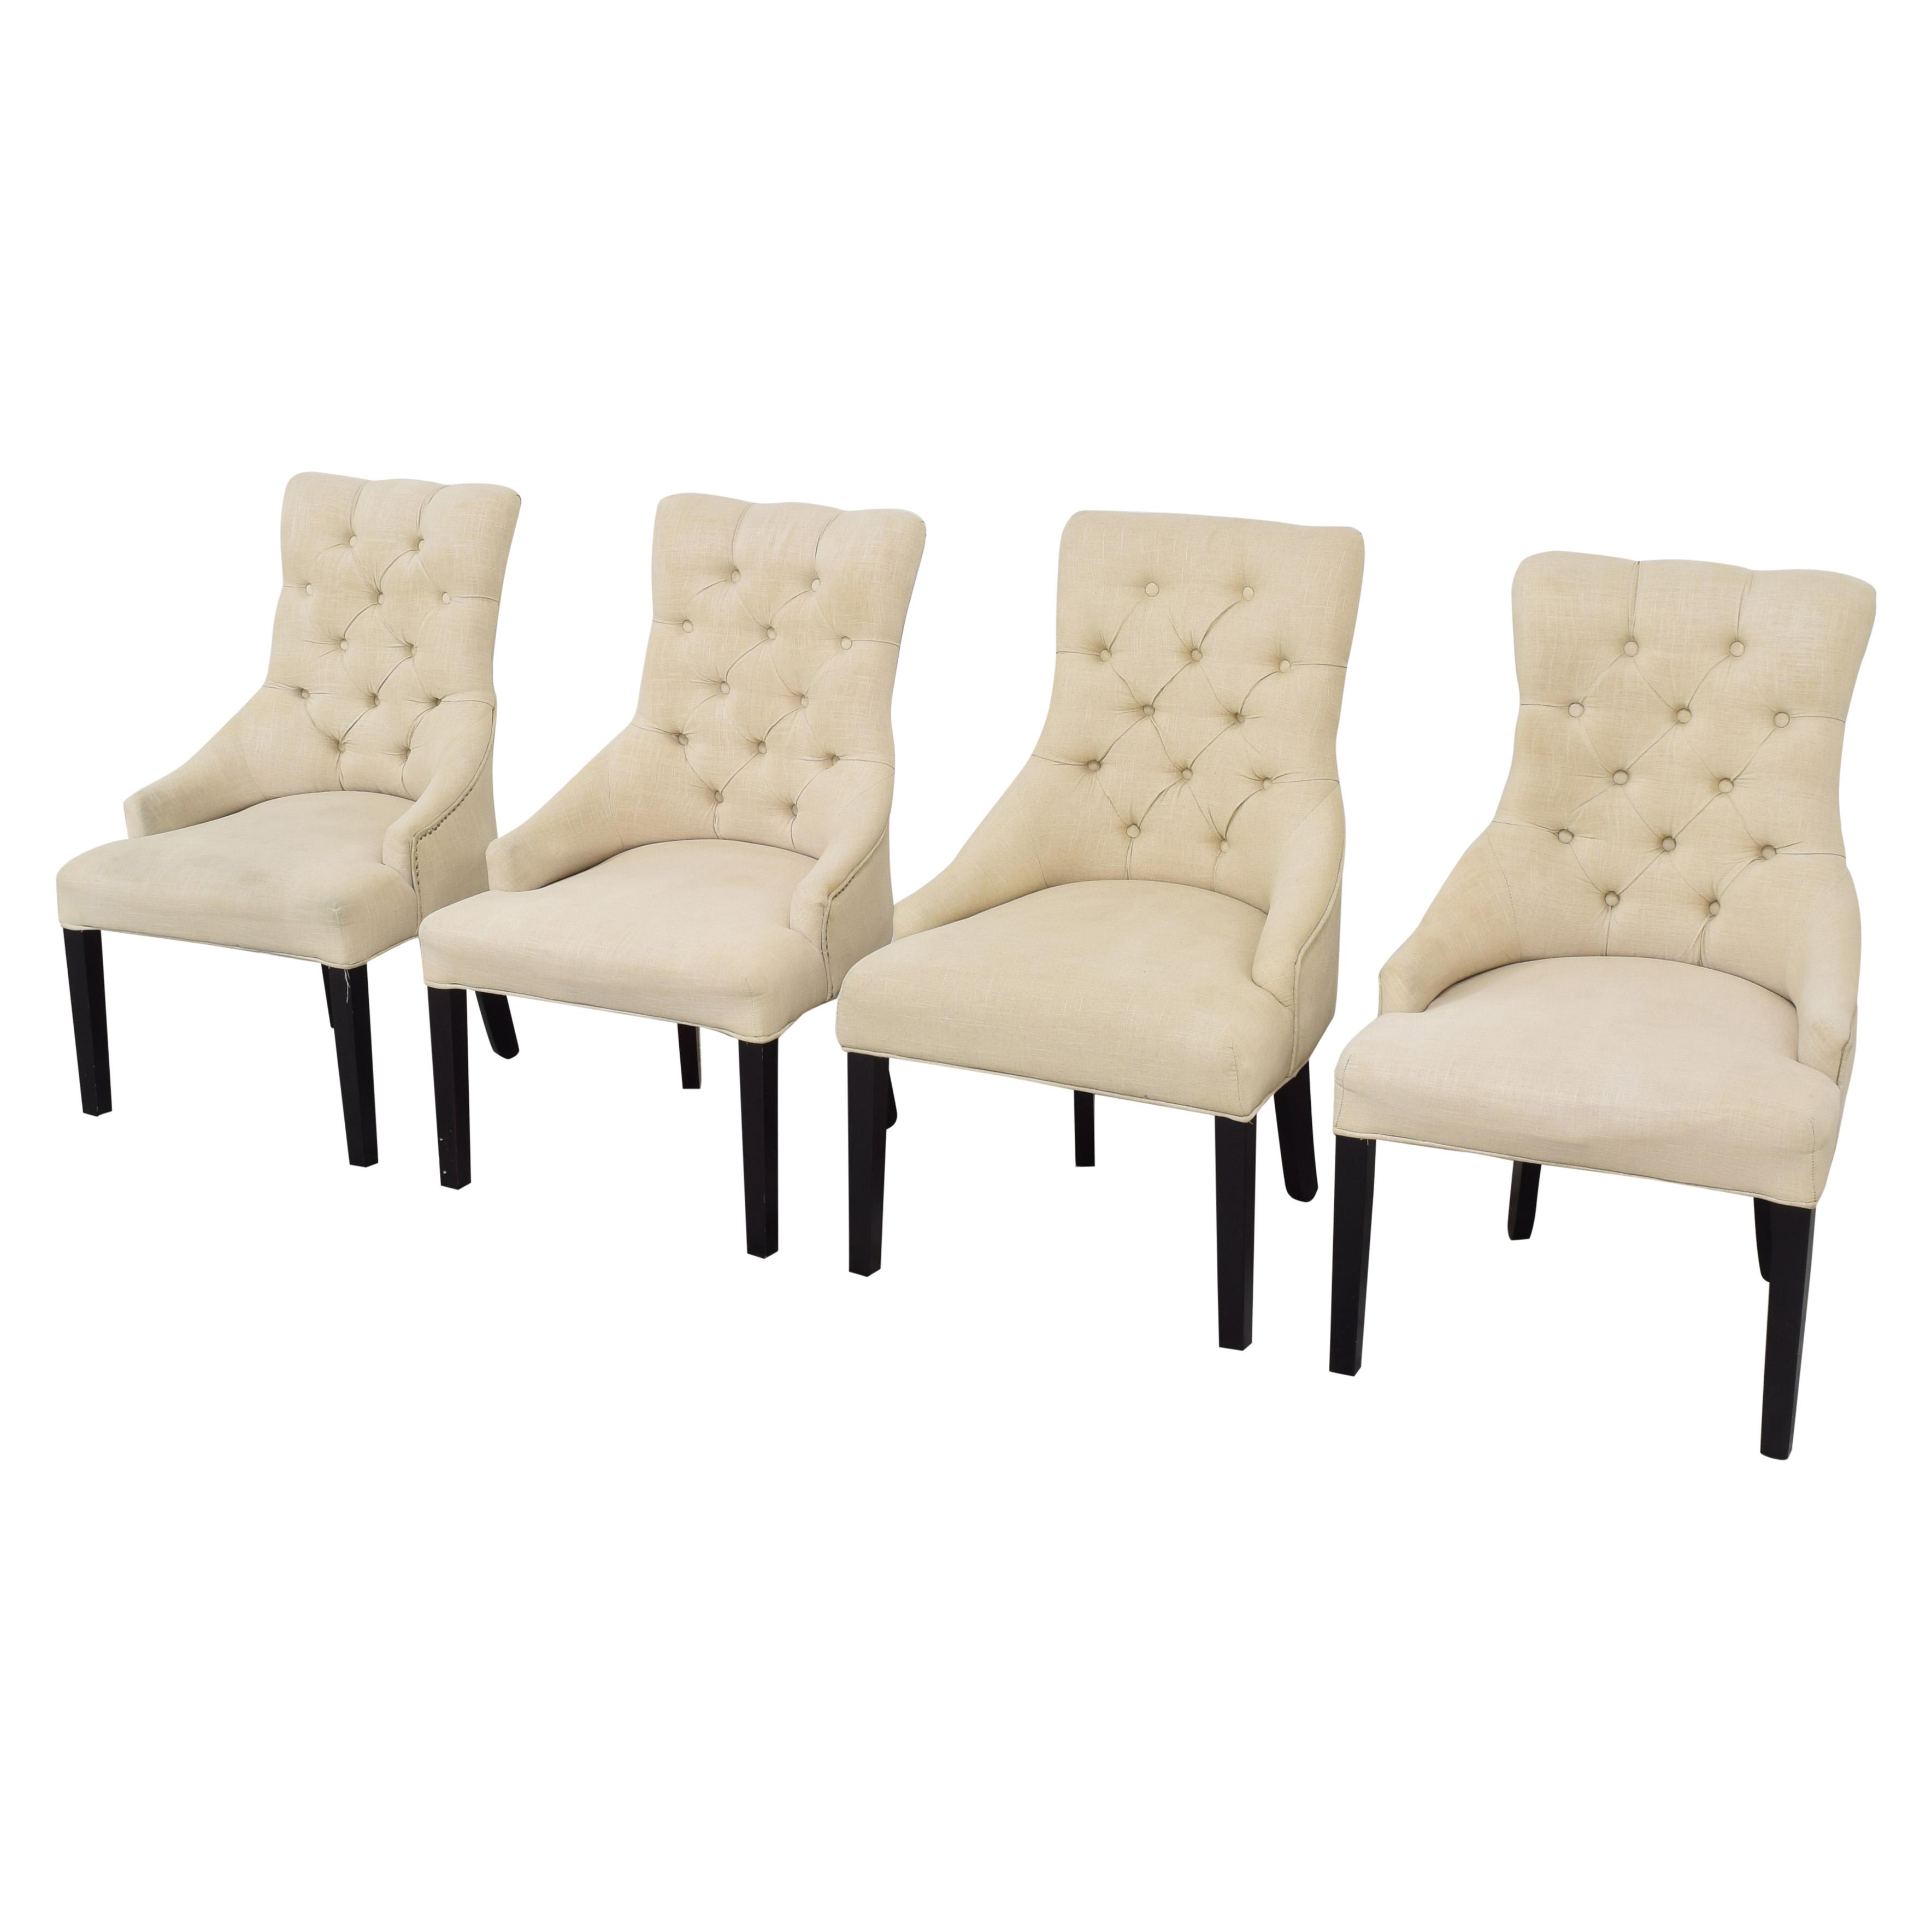 Macy's Macy's Marais Dining Parsons Chairs used